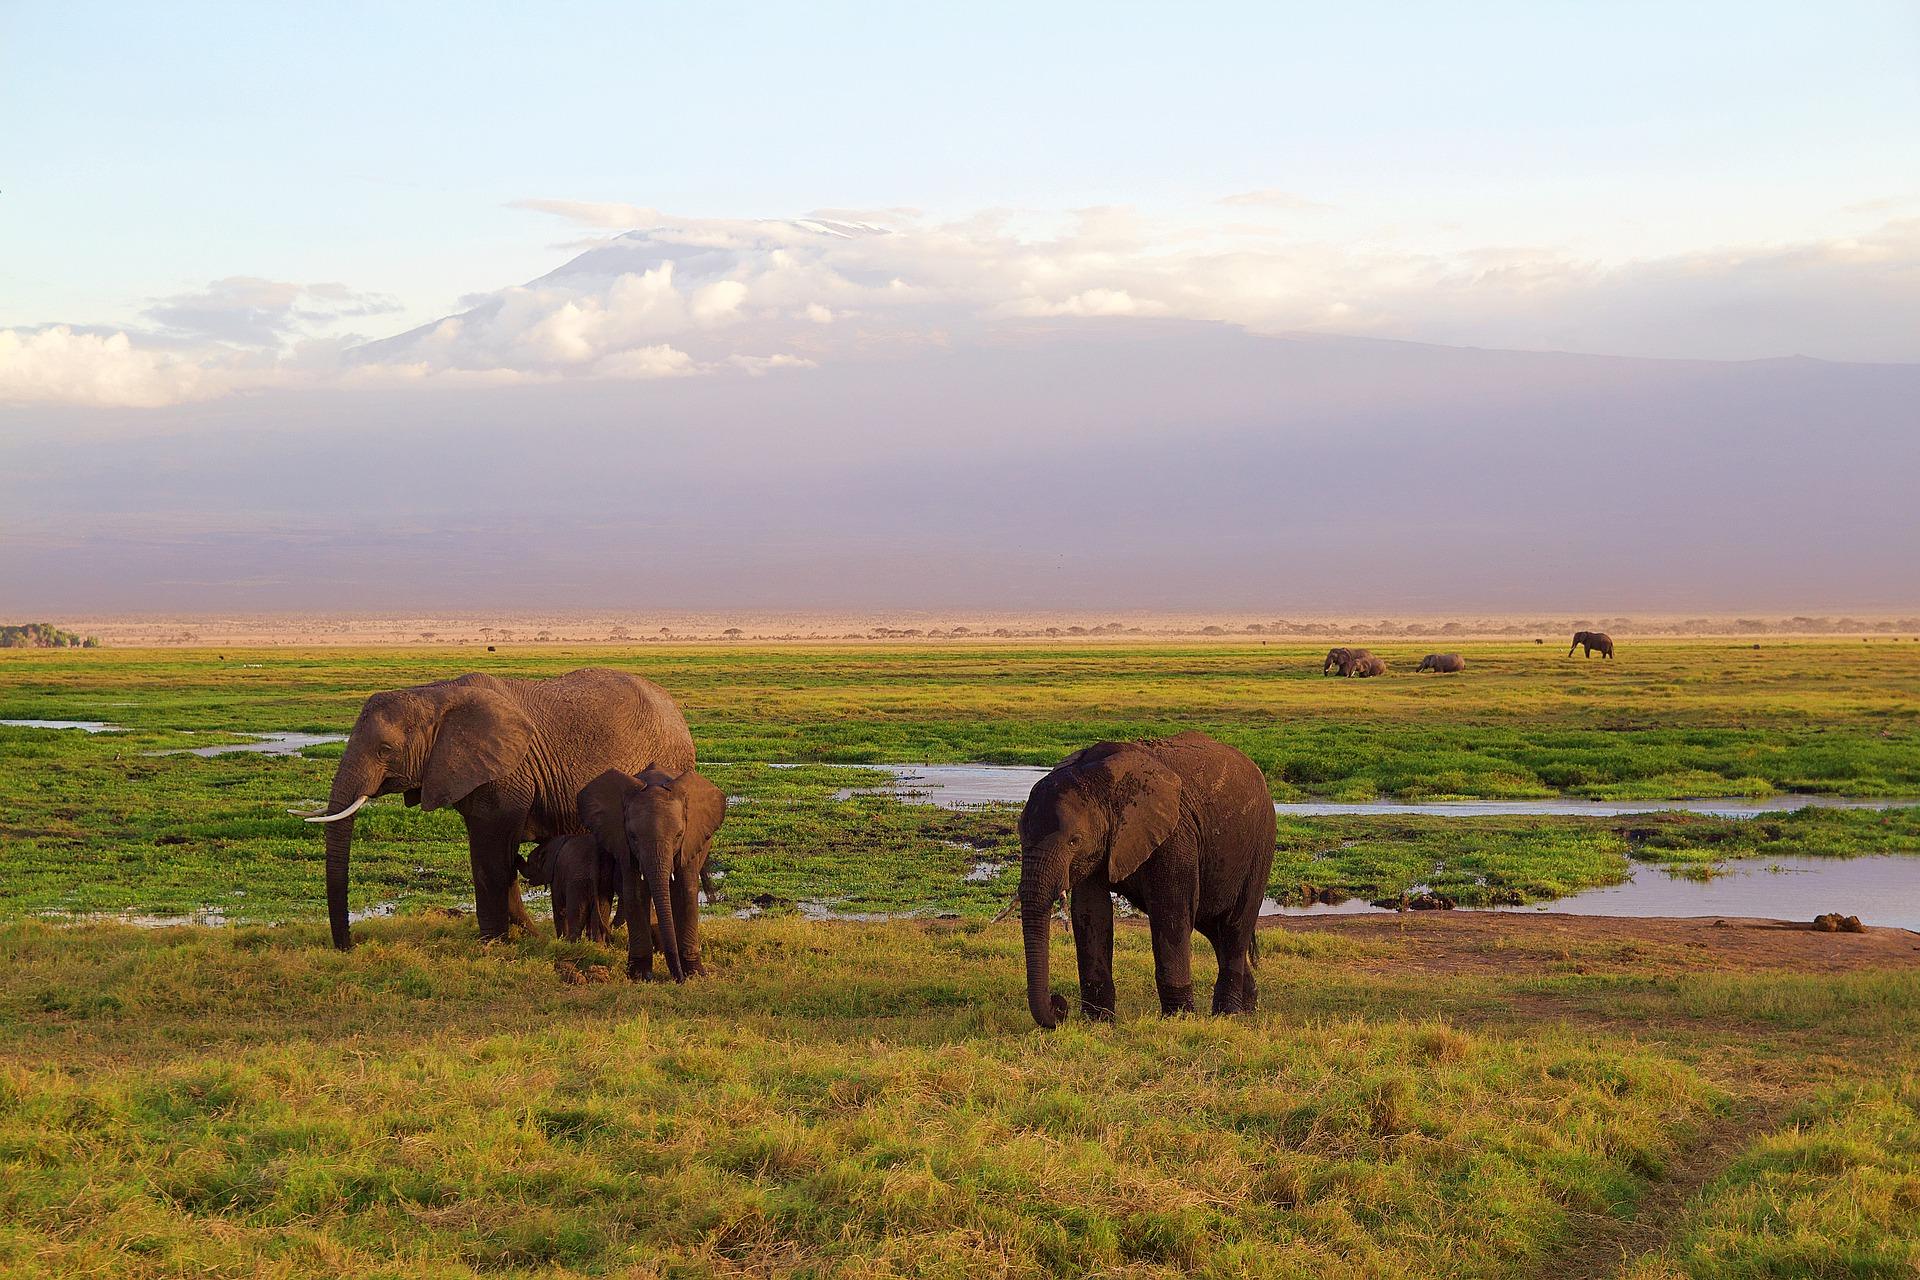 Kenya - Wildlife (Elephants)